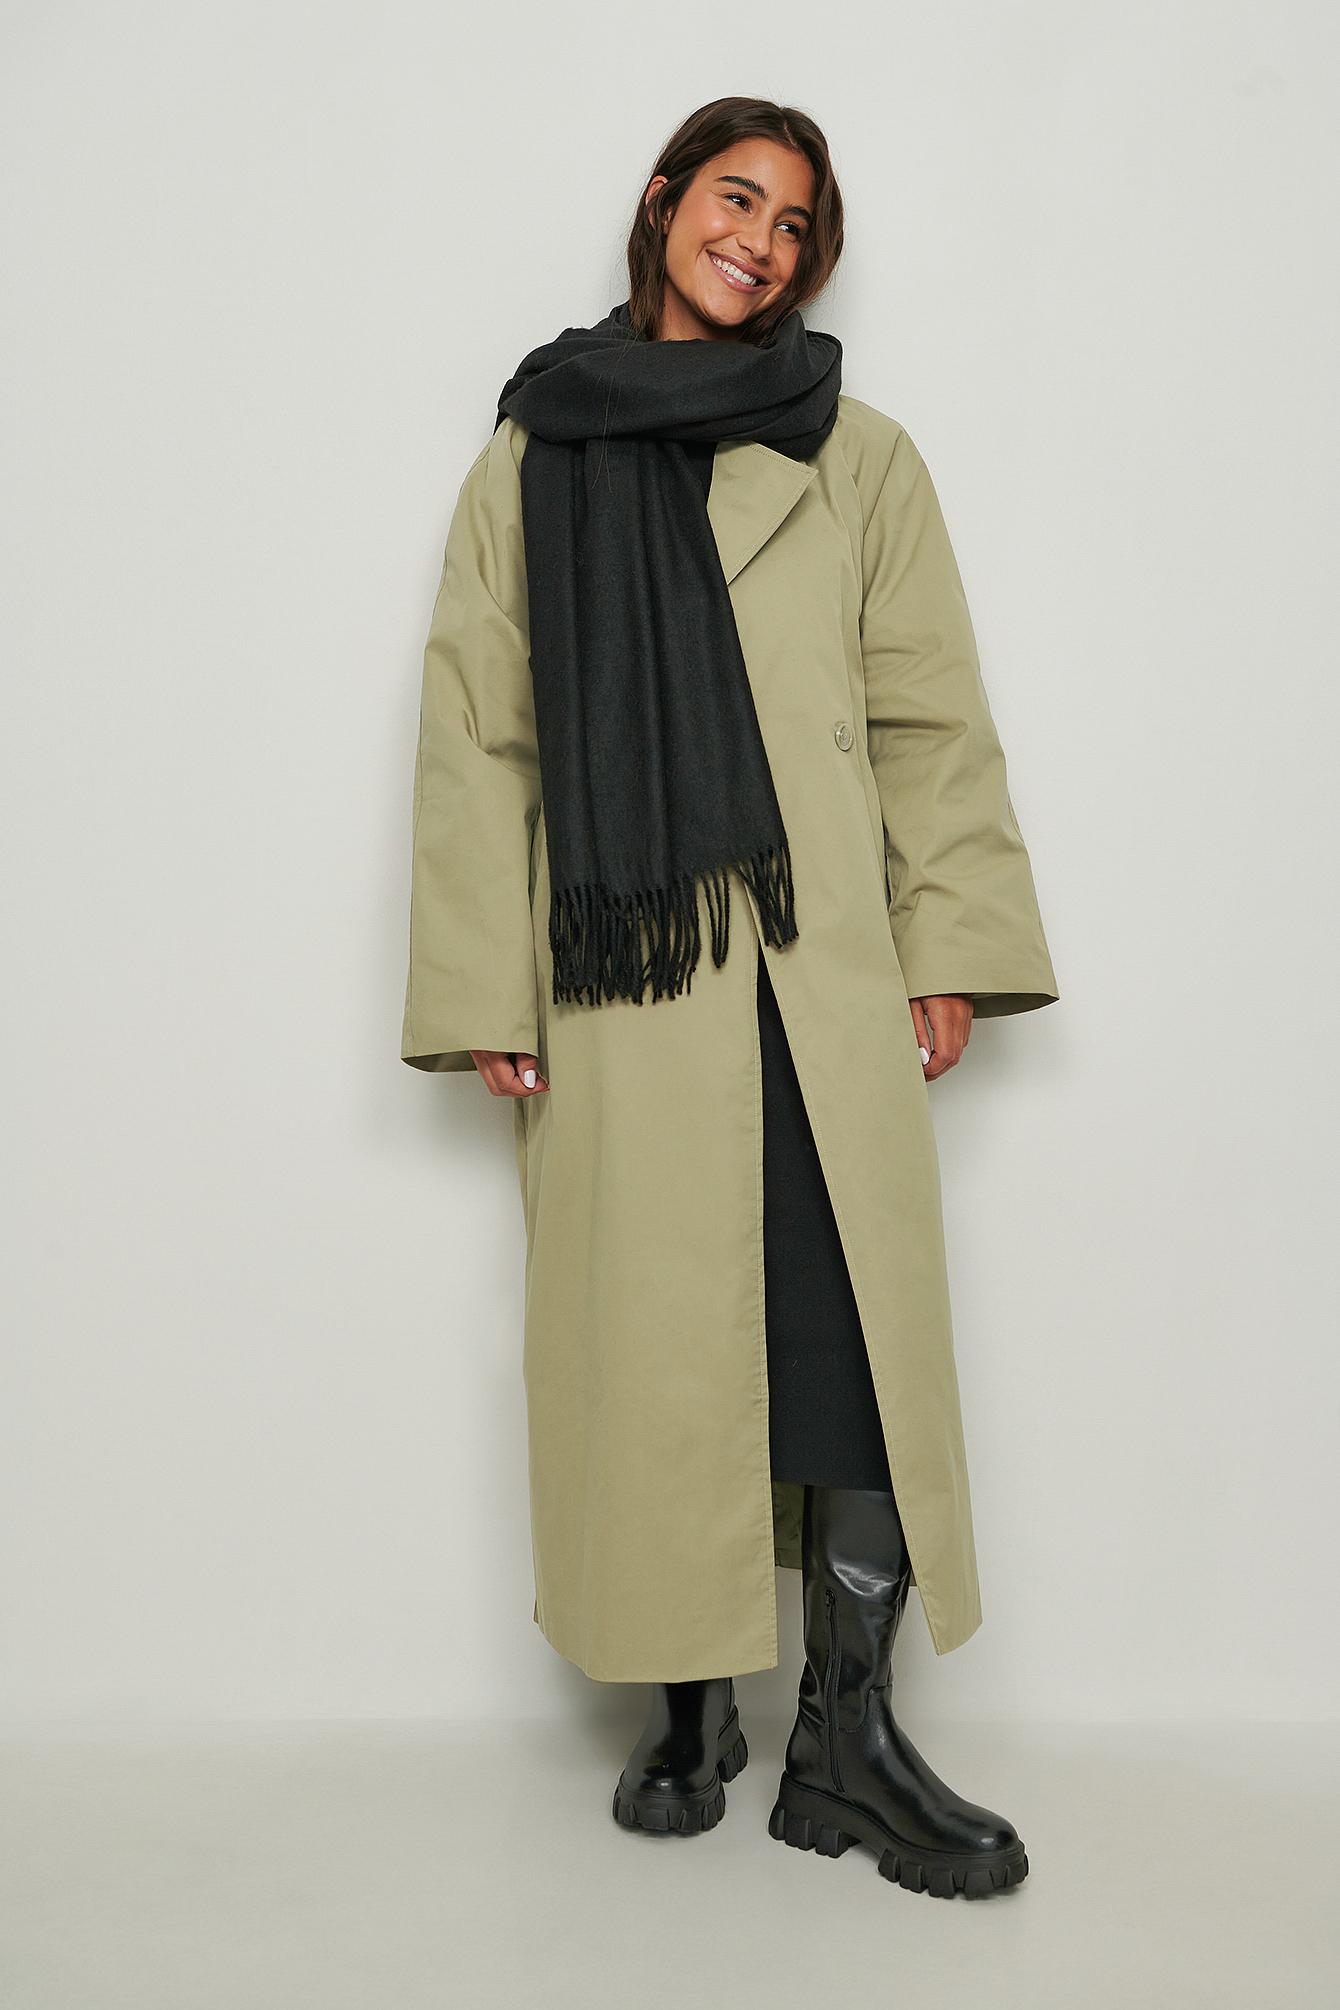 NA-KD Accessories Tørklæde i uld - Black